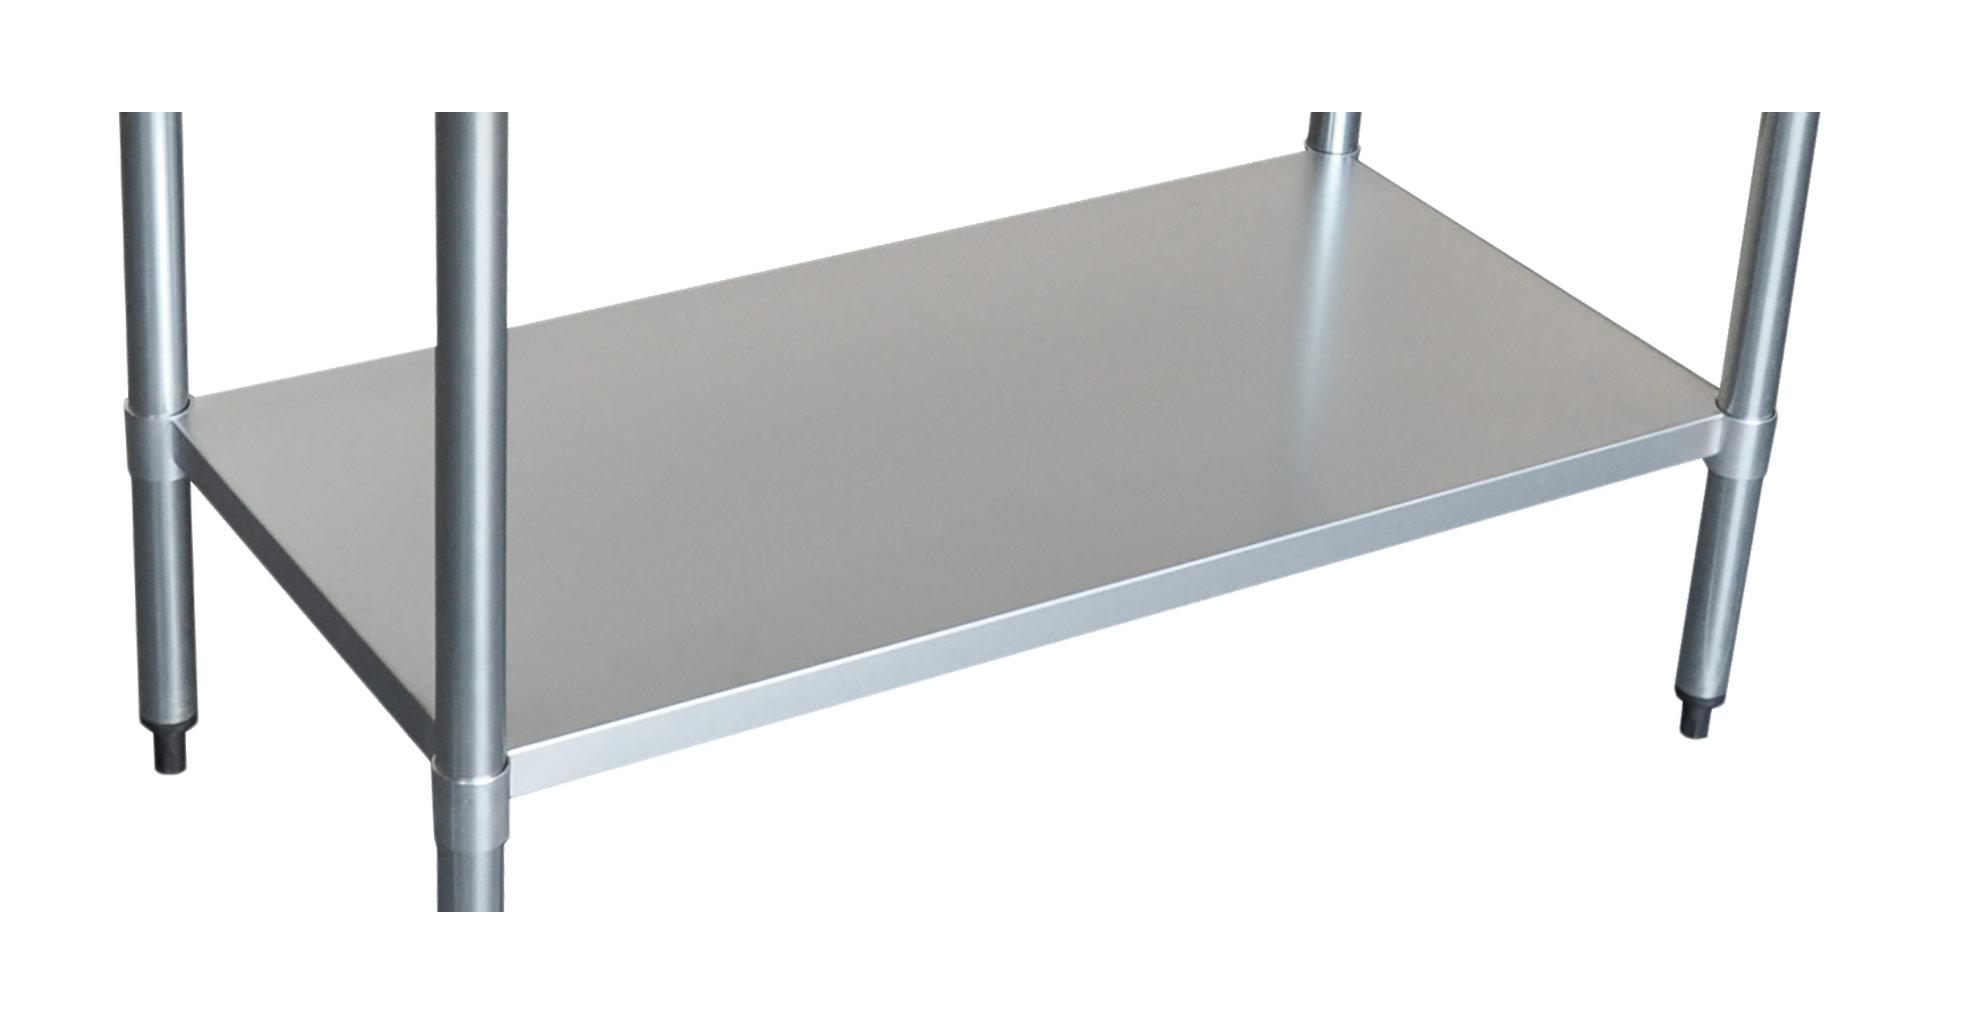 Stainless Undershelf for 3048 Bench